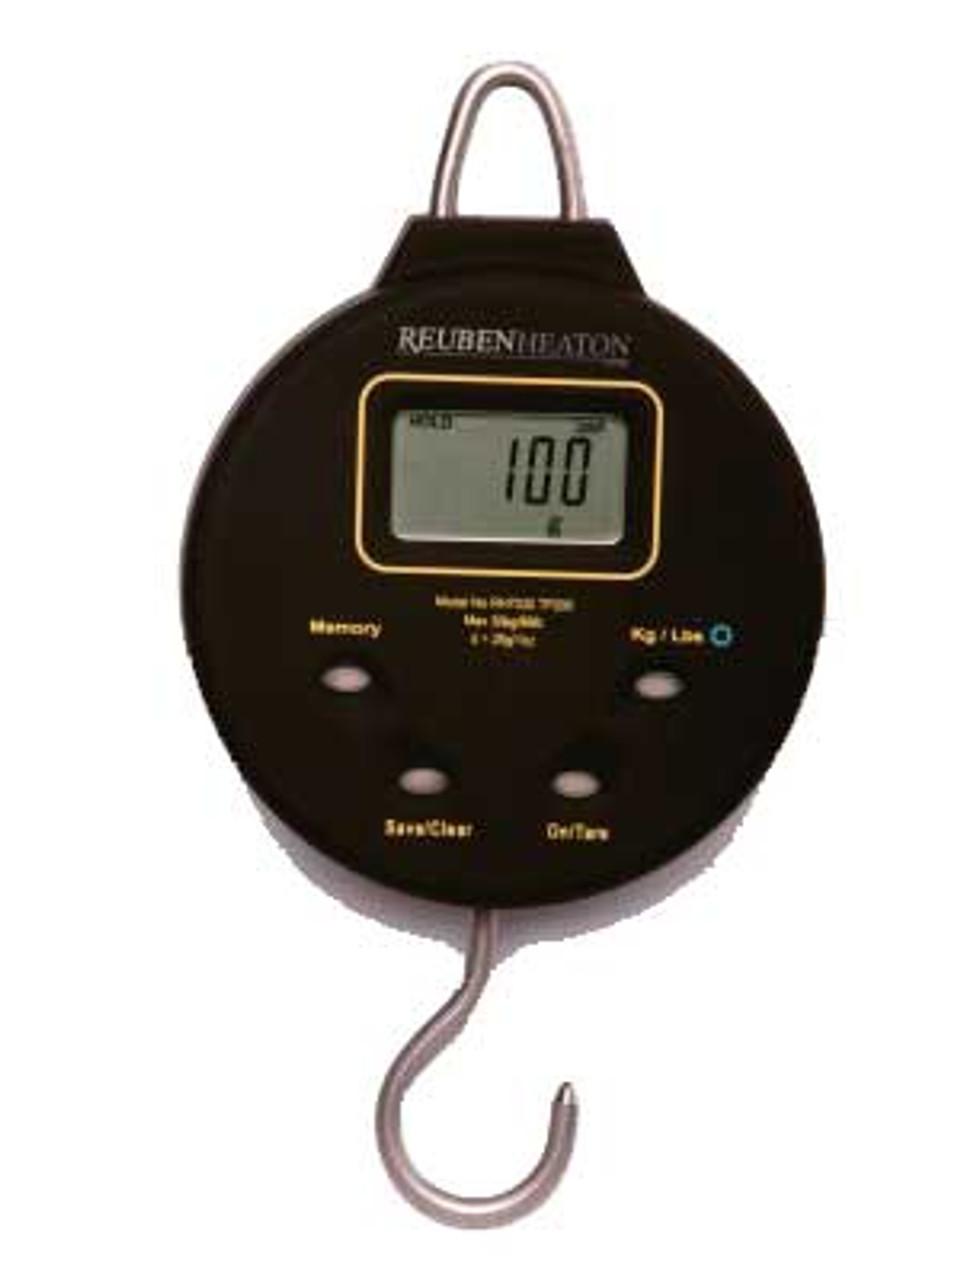 ReubenHeaton 7000 Series Digital Scale 132lb/60kg